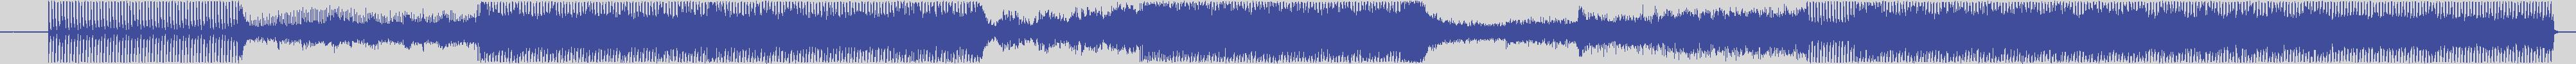 just_digital_records [JS1186] Malden - Going Free [Original Mix] audio wave form